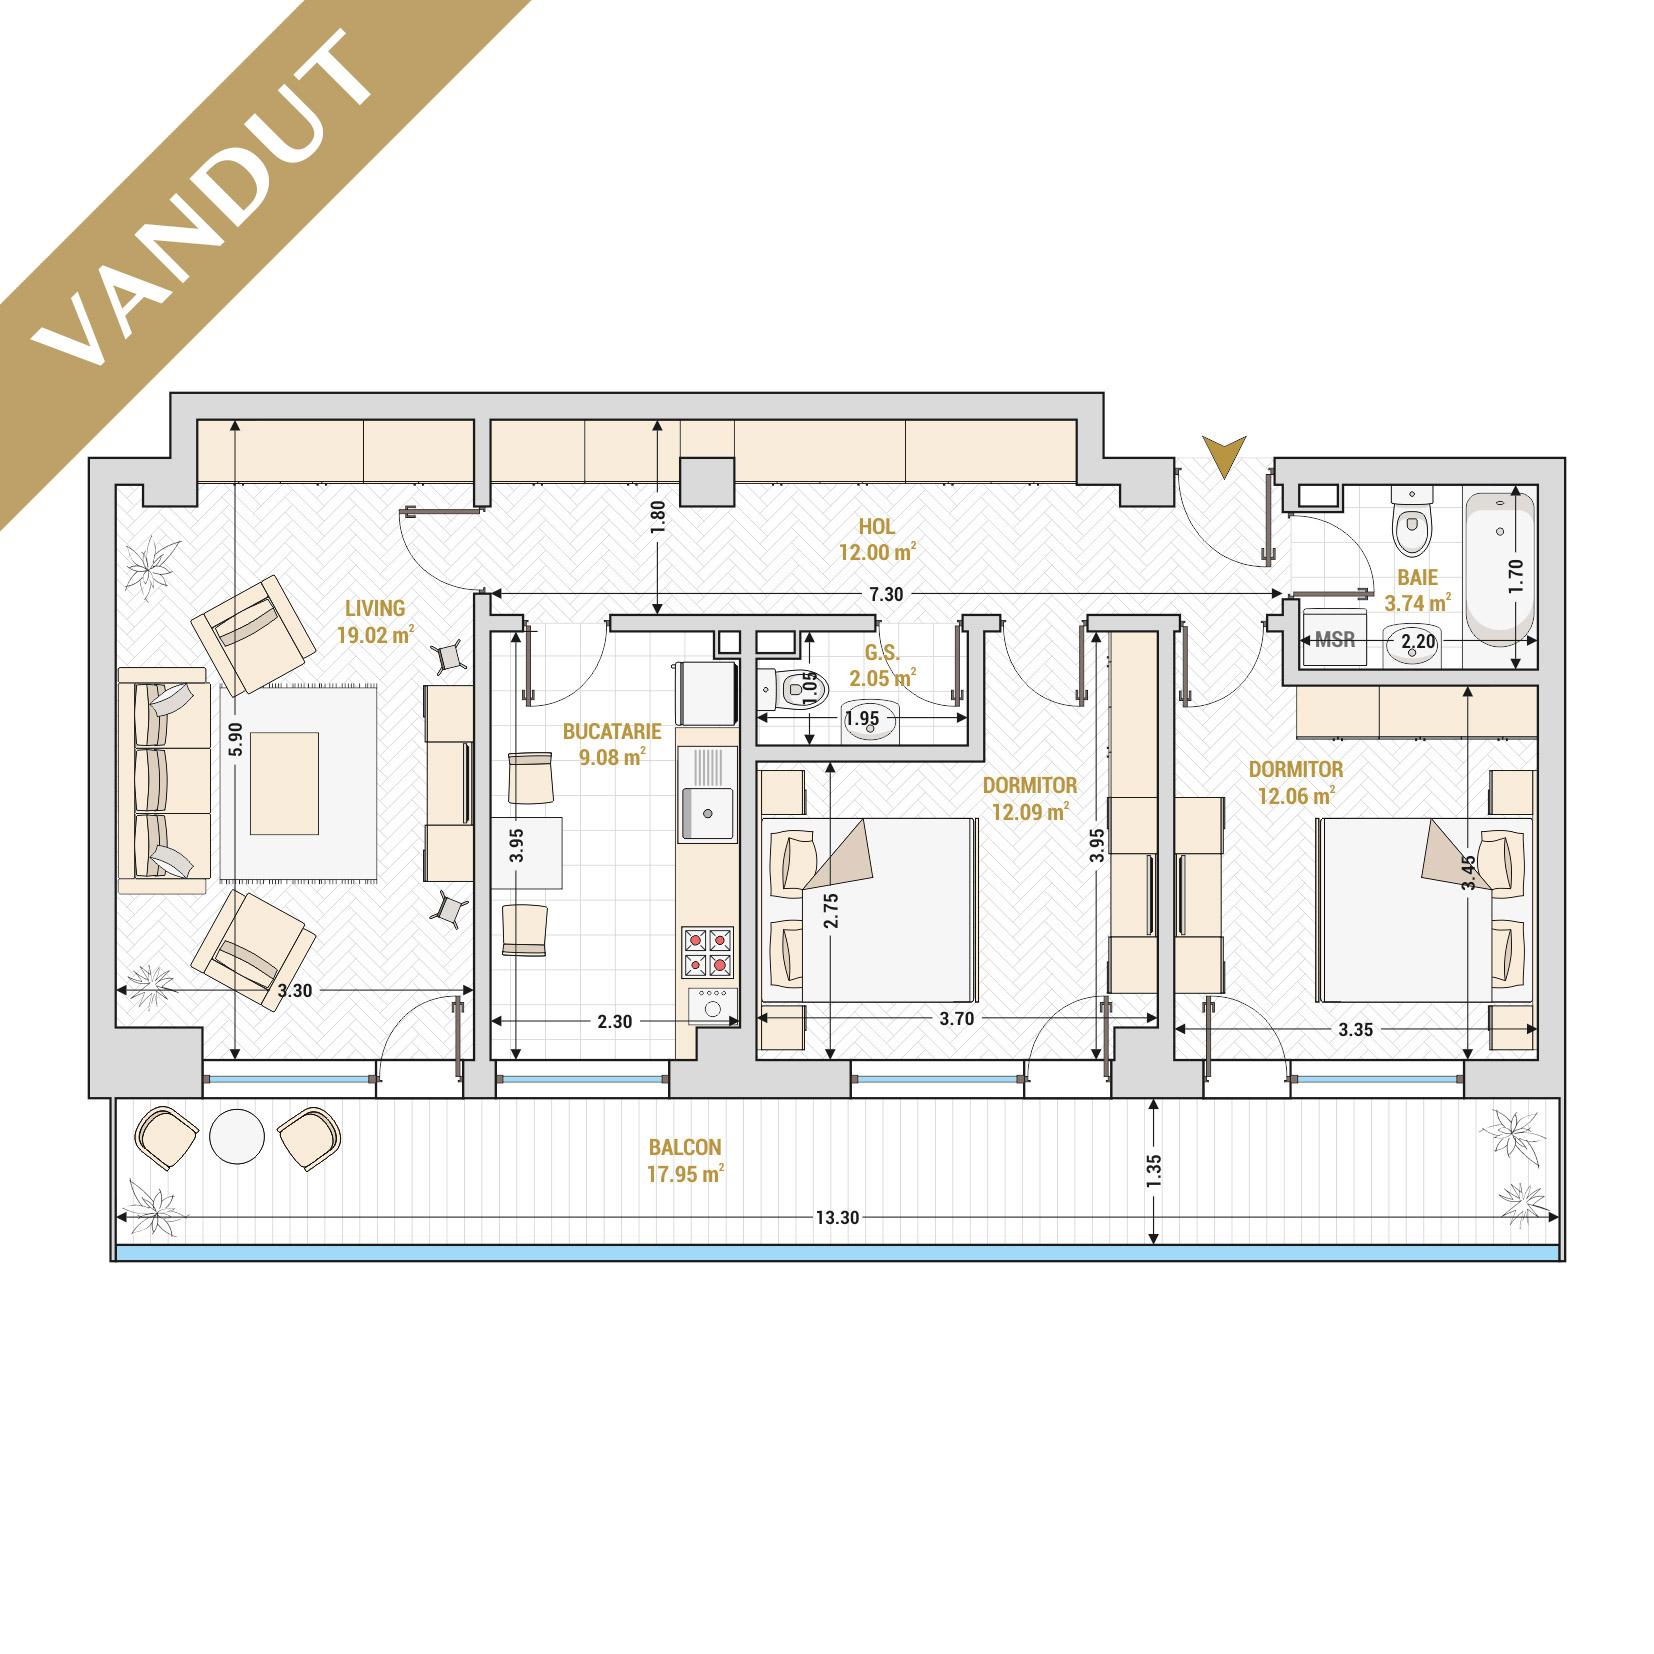 Apartament 3 camere de vanzare Bucuresti - Catedral Residence - Marriott, Piata Unirii, 13 Septembrie, Izvor - Tip 5 - T2 - VANDUT